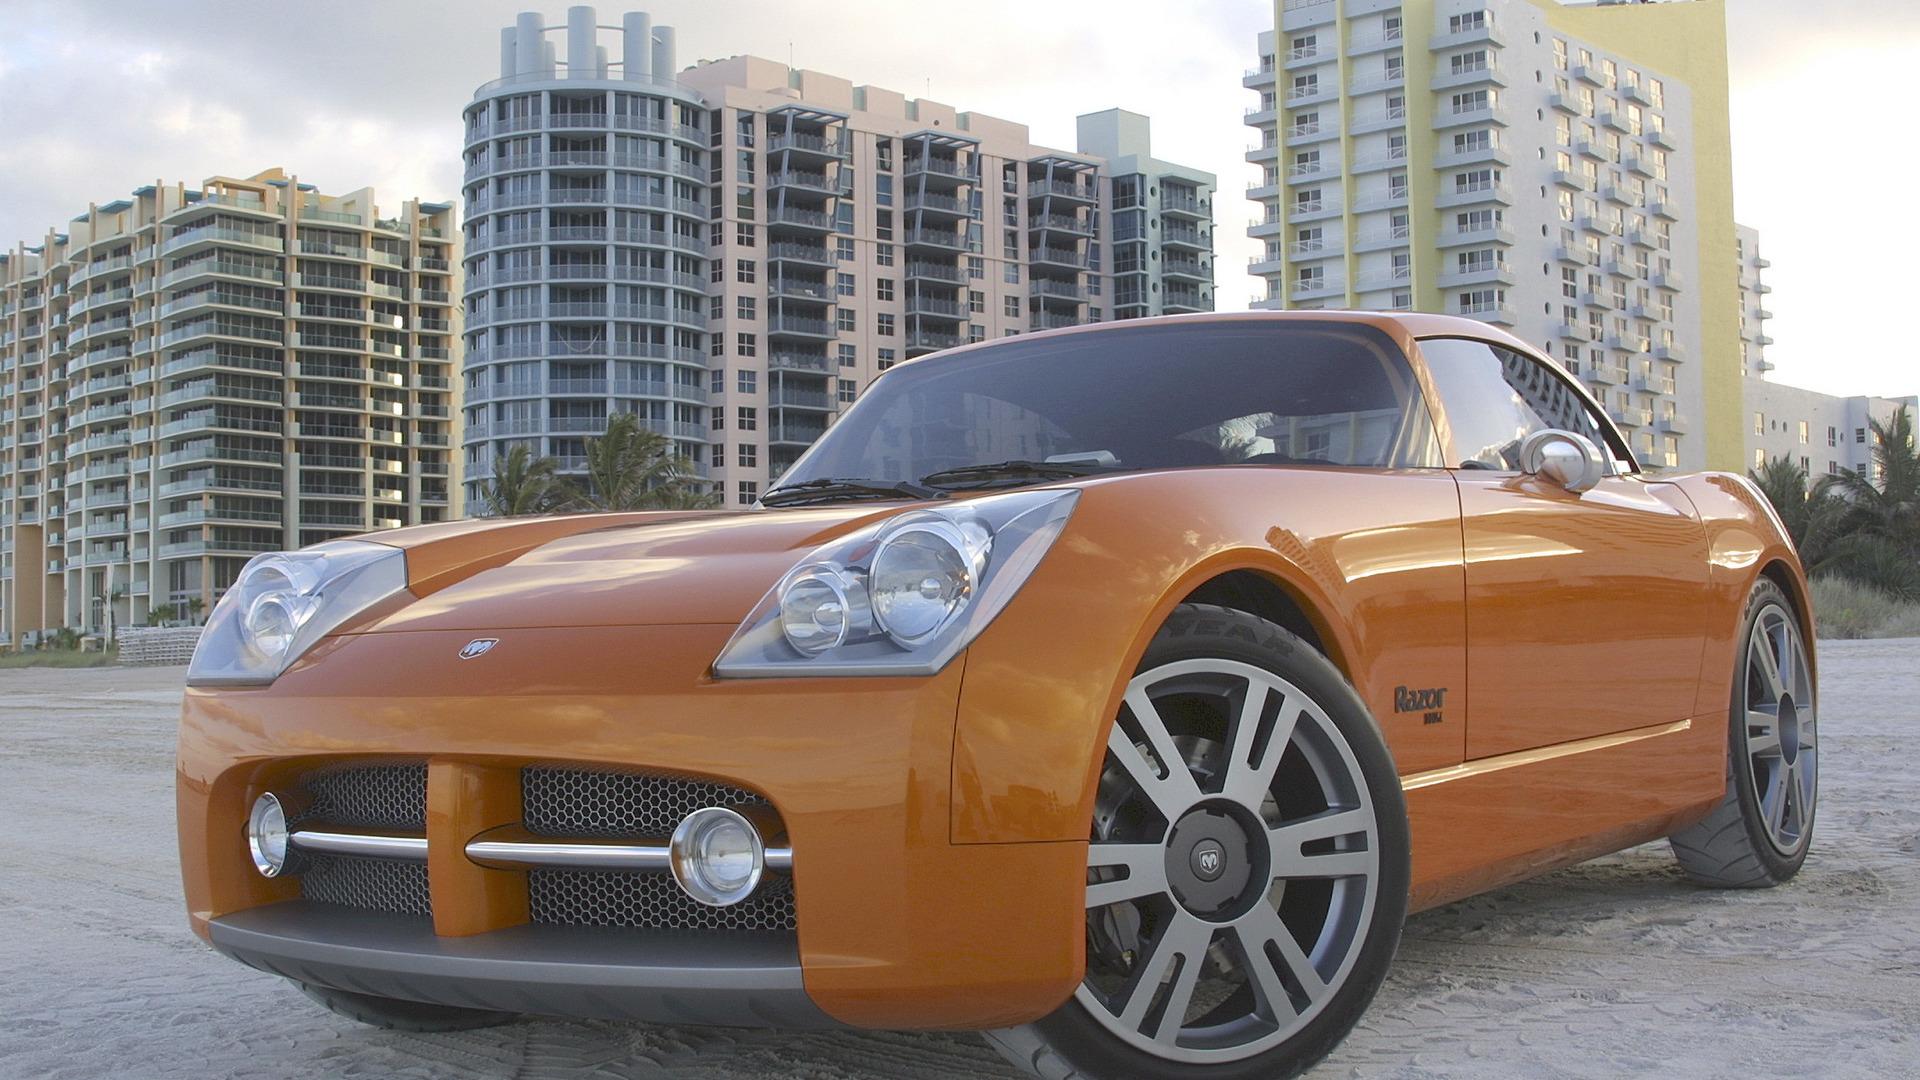 2002-dodge-razor-concept (4)